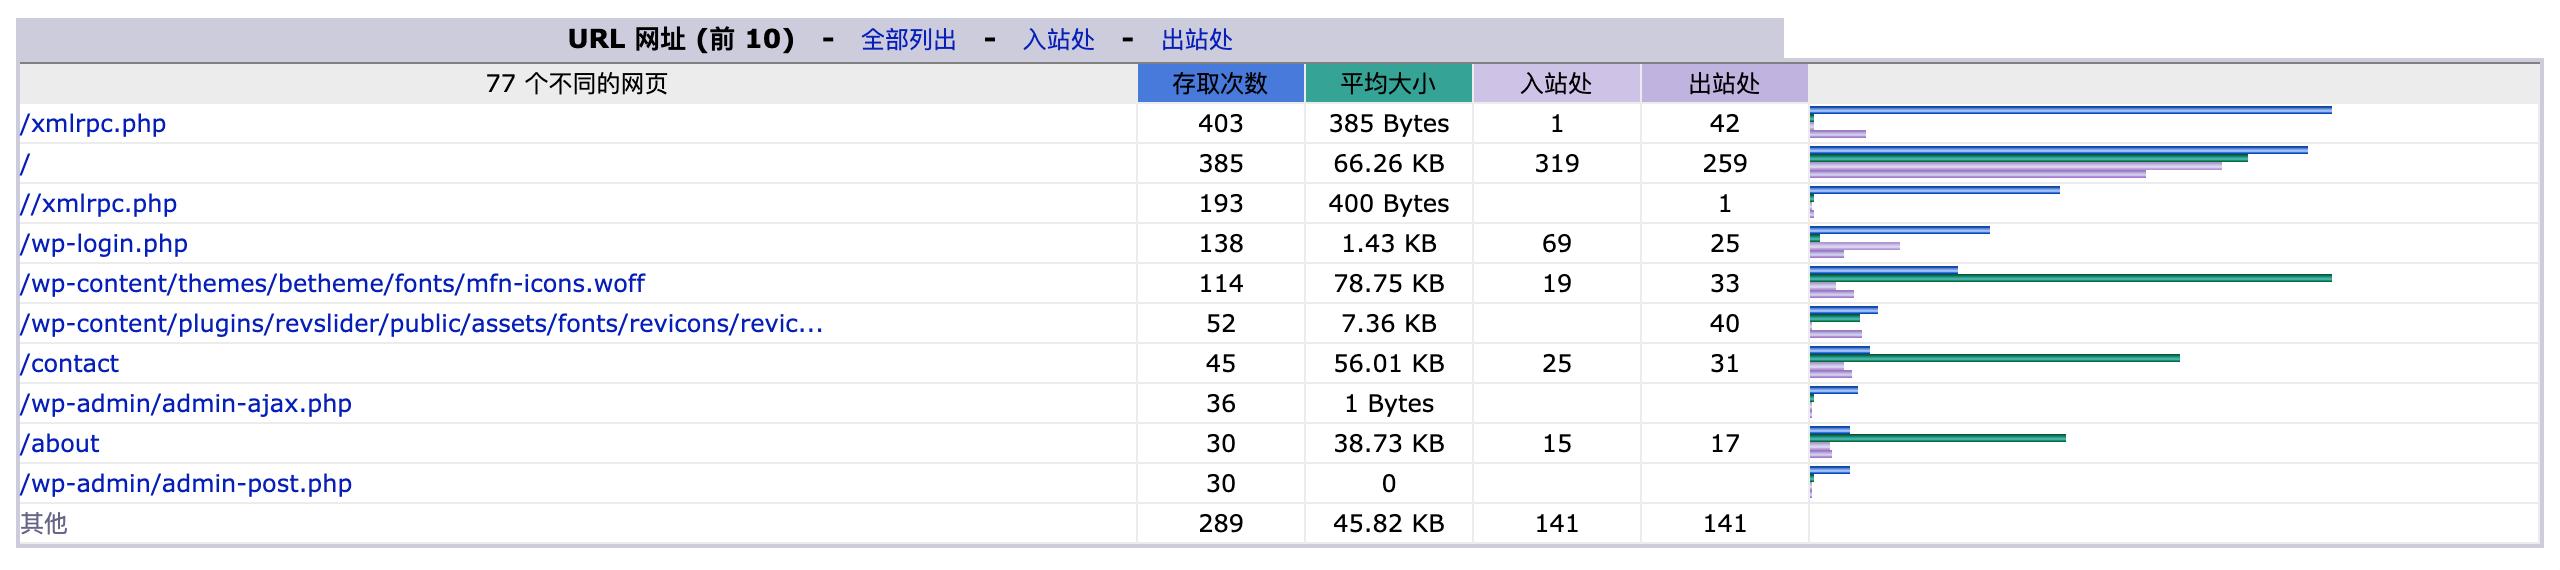 "WordPress企业站用阿里云空间虚拟主机由于""耗资源""被主机商关停怎么办?"